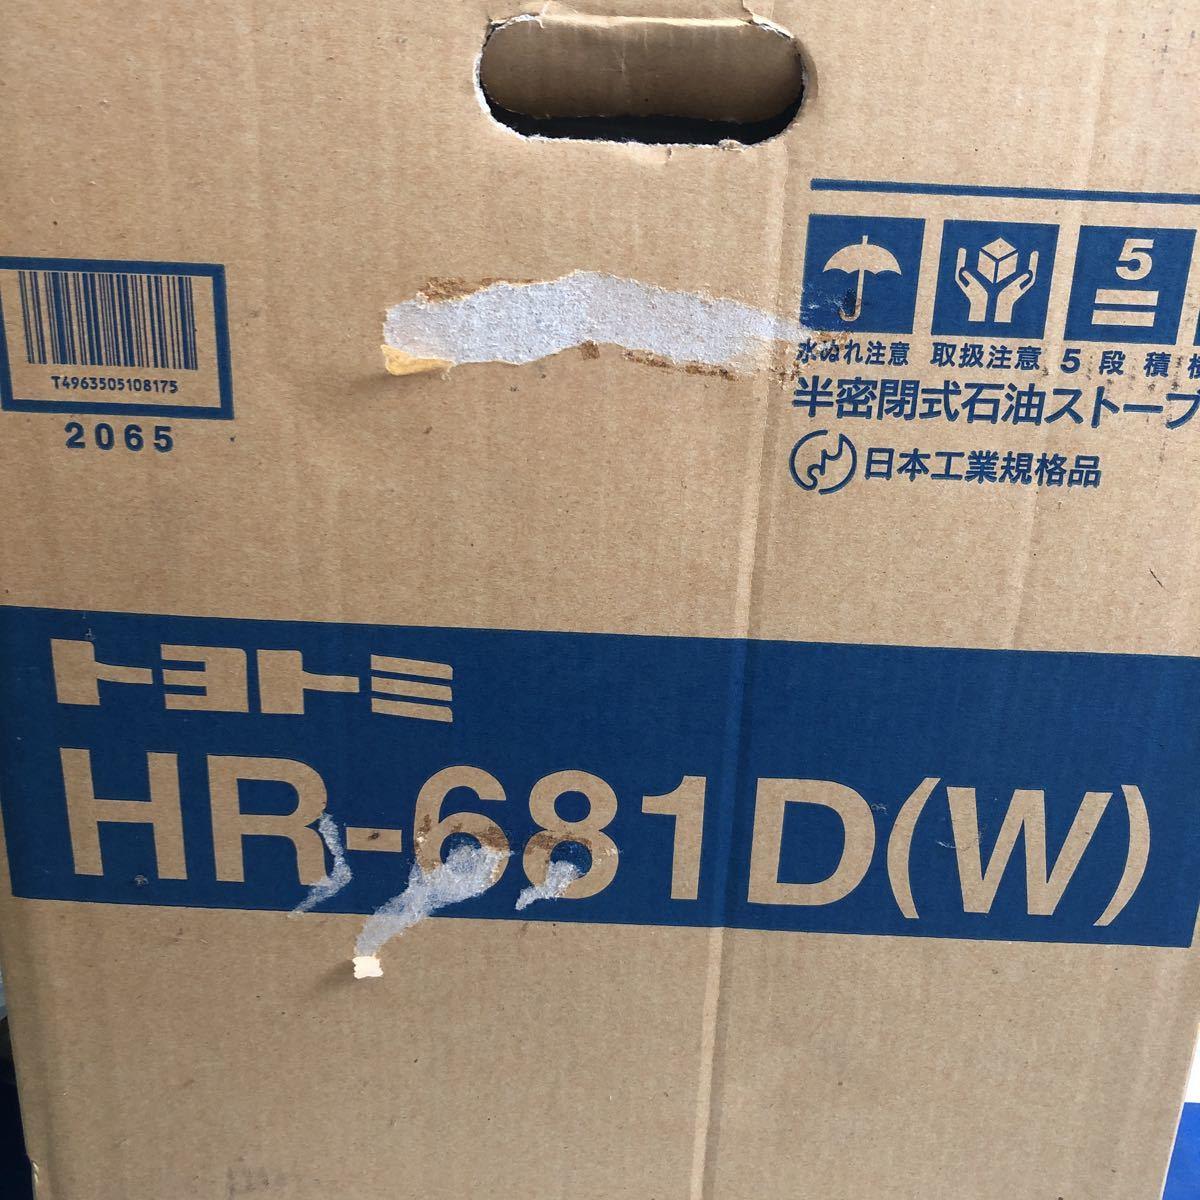 TOYOTOMI トヨトミ HR-681D ホワイト 半密閉式ストーブ 未使用★2631_画像2